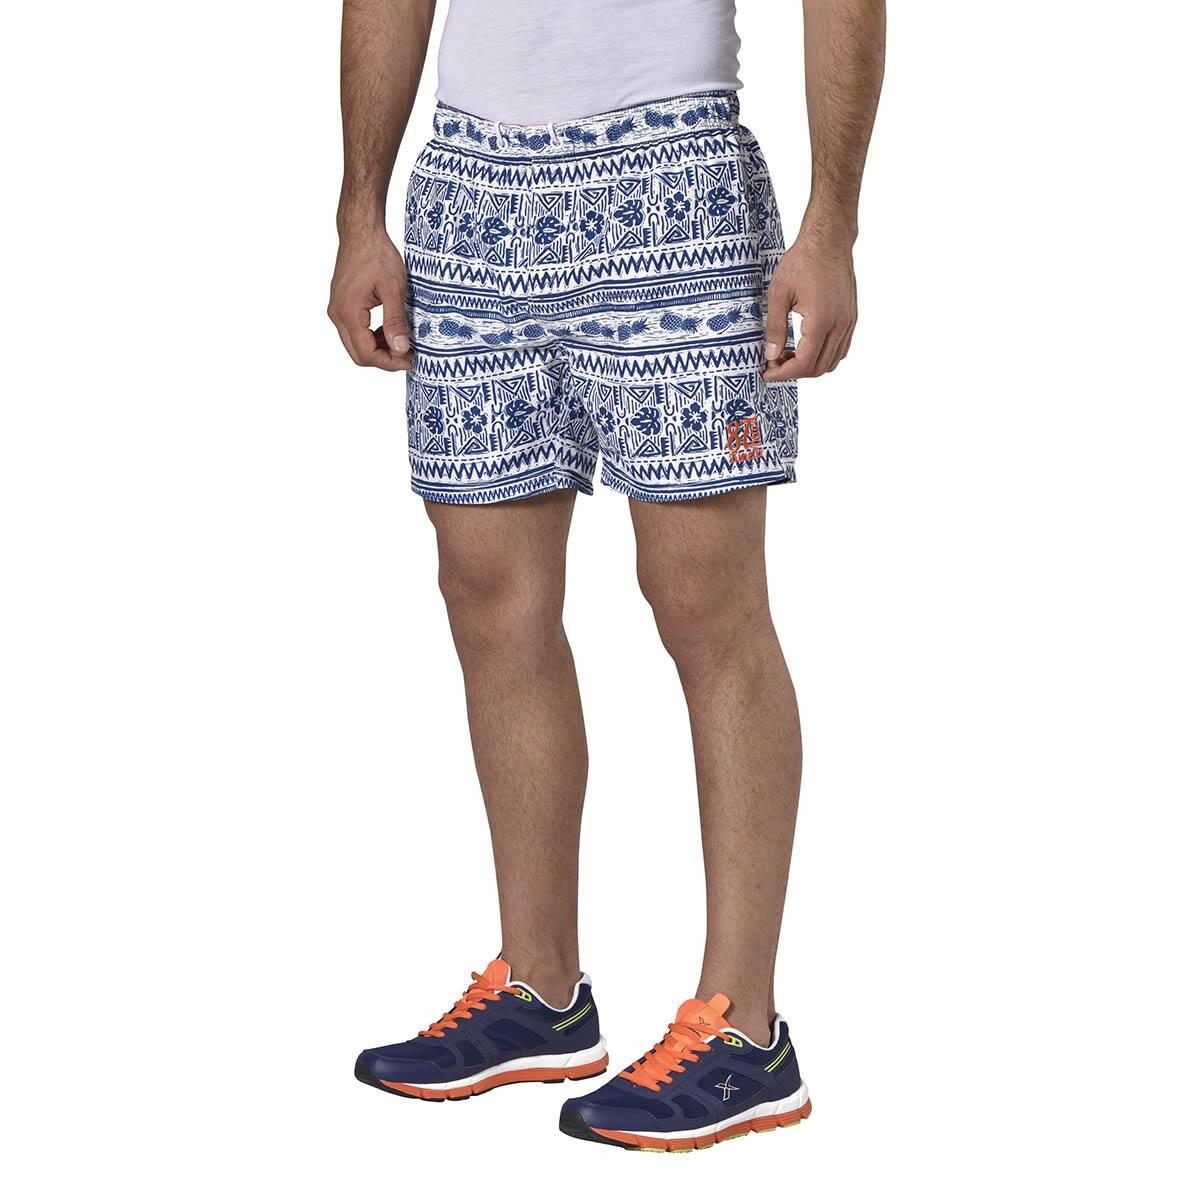 FLO A5131603 White Male Shorts KINETIX